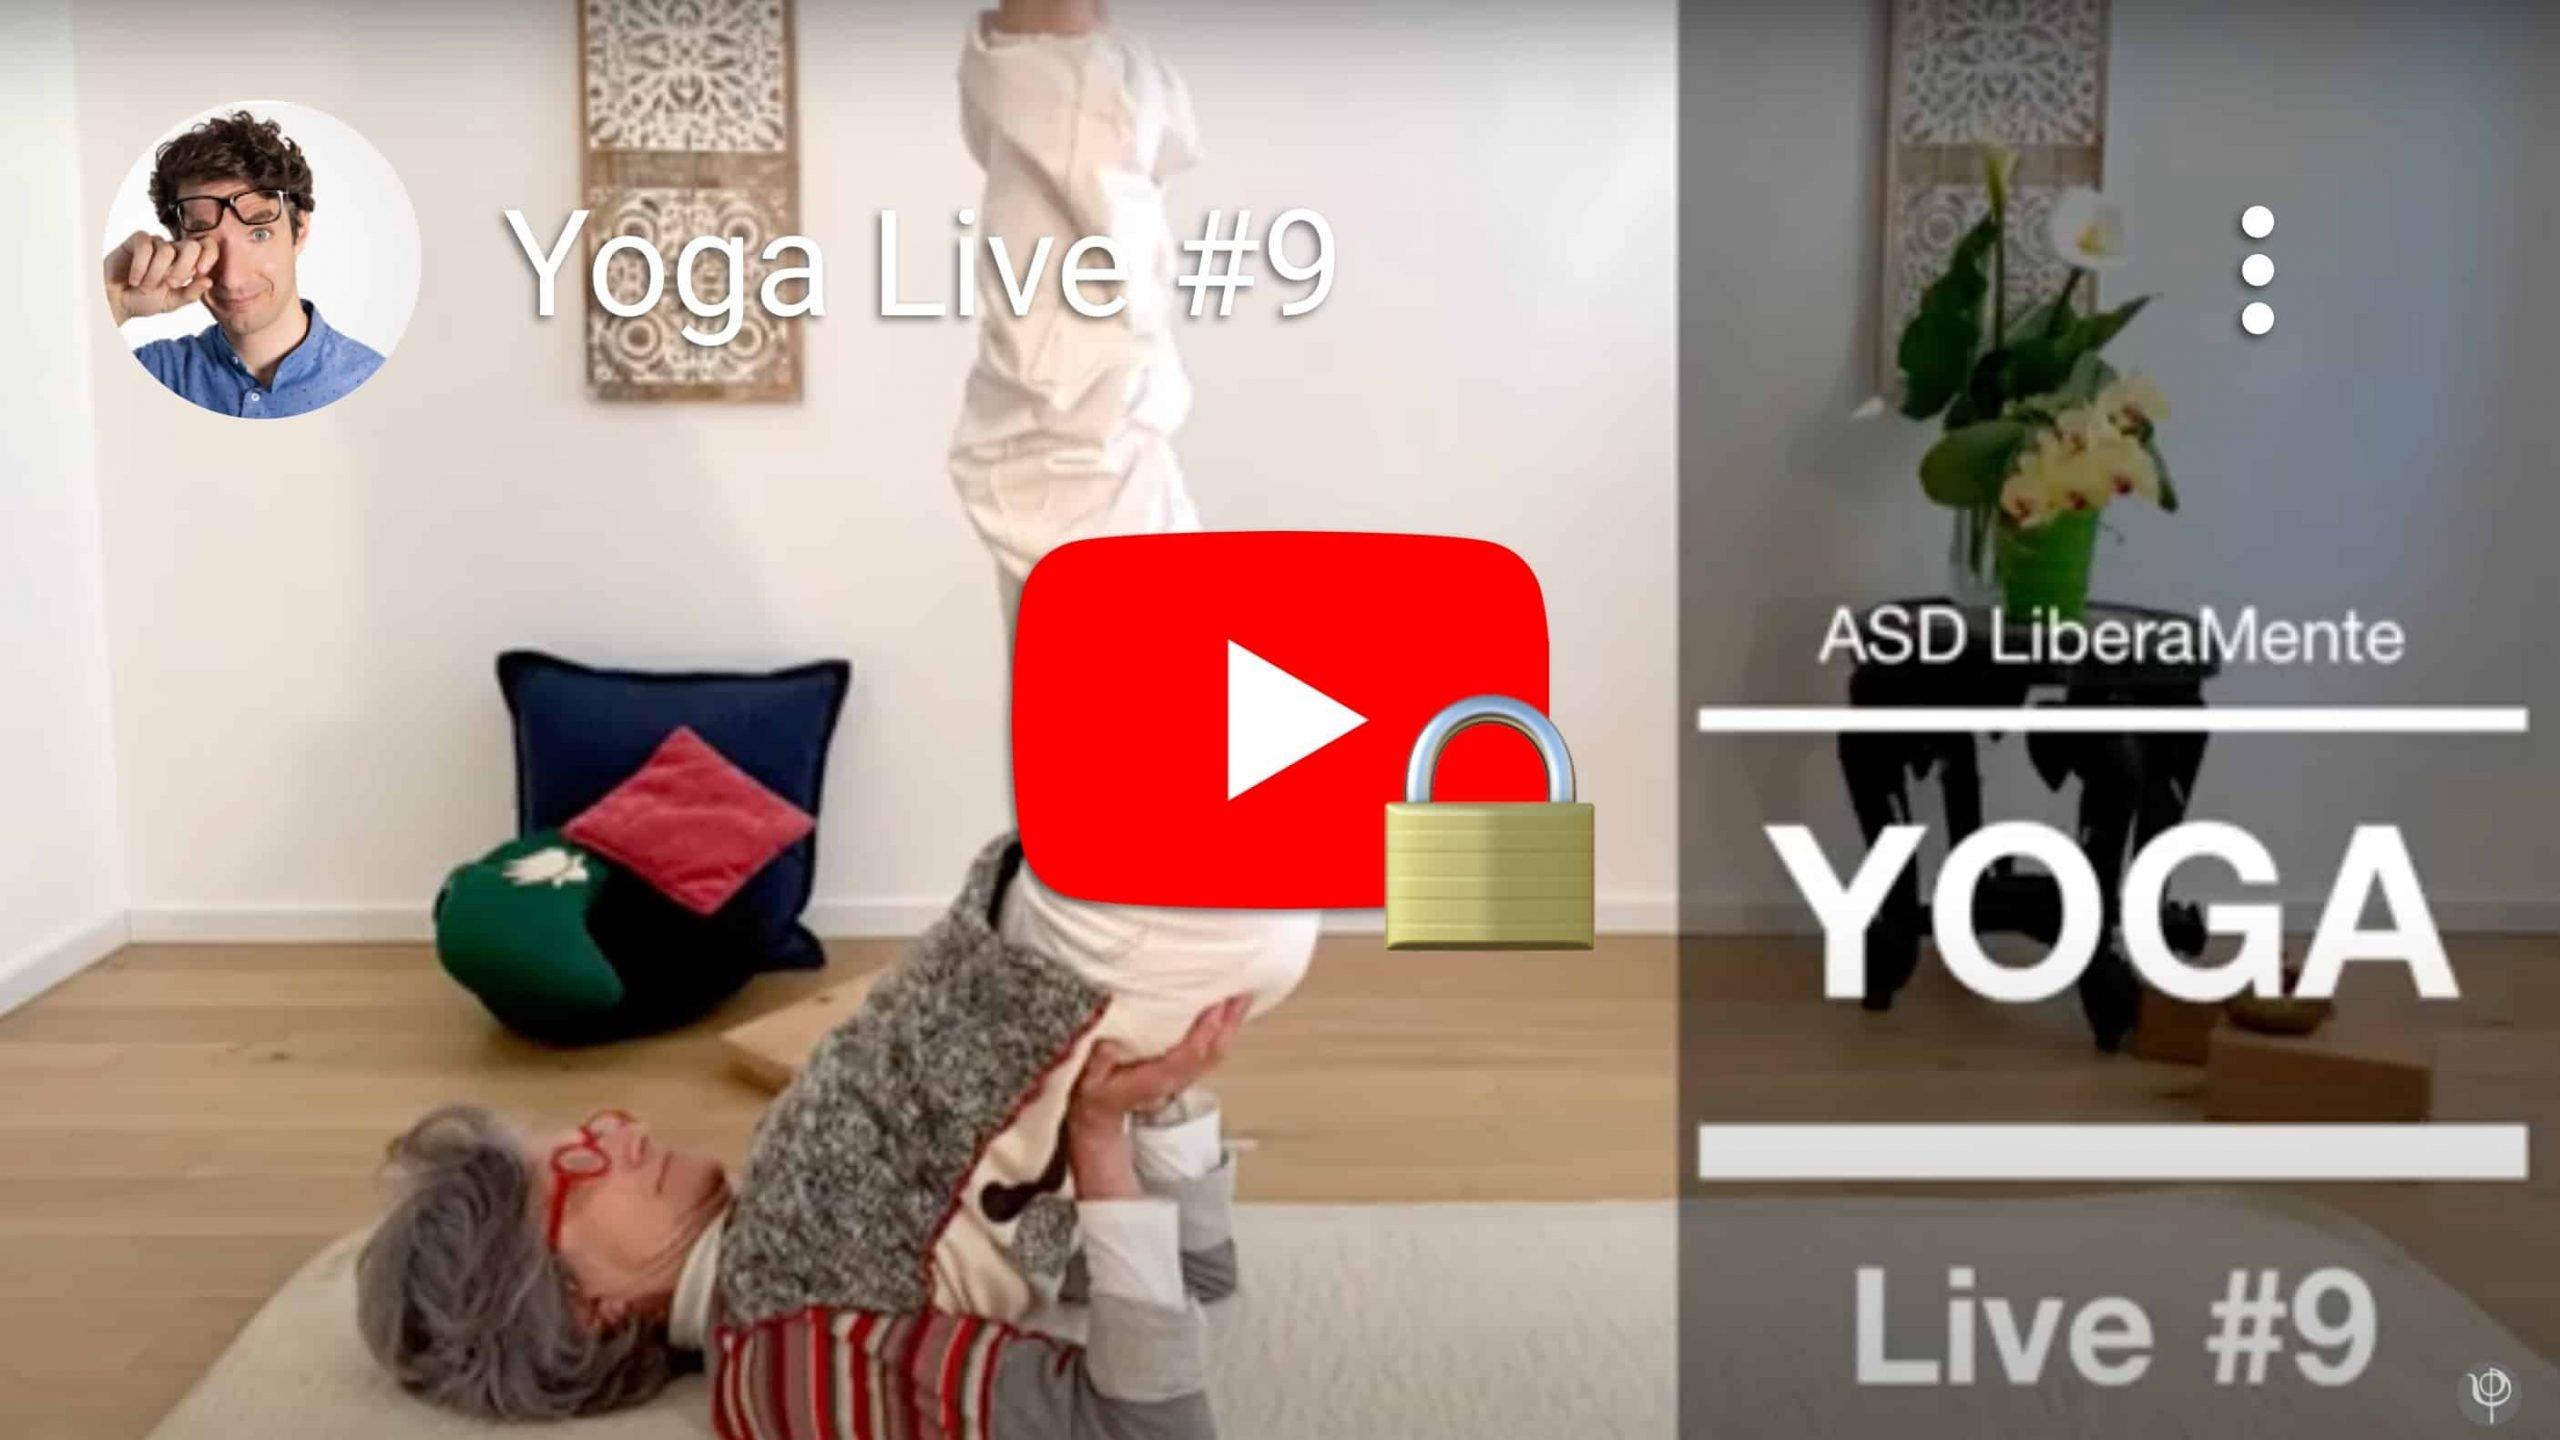 Yoga diretta Facebook #9